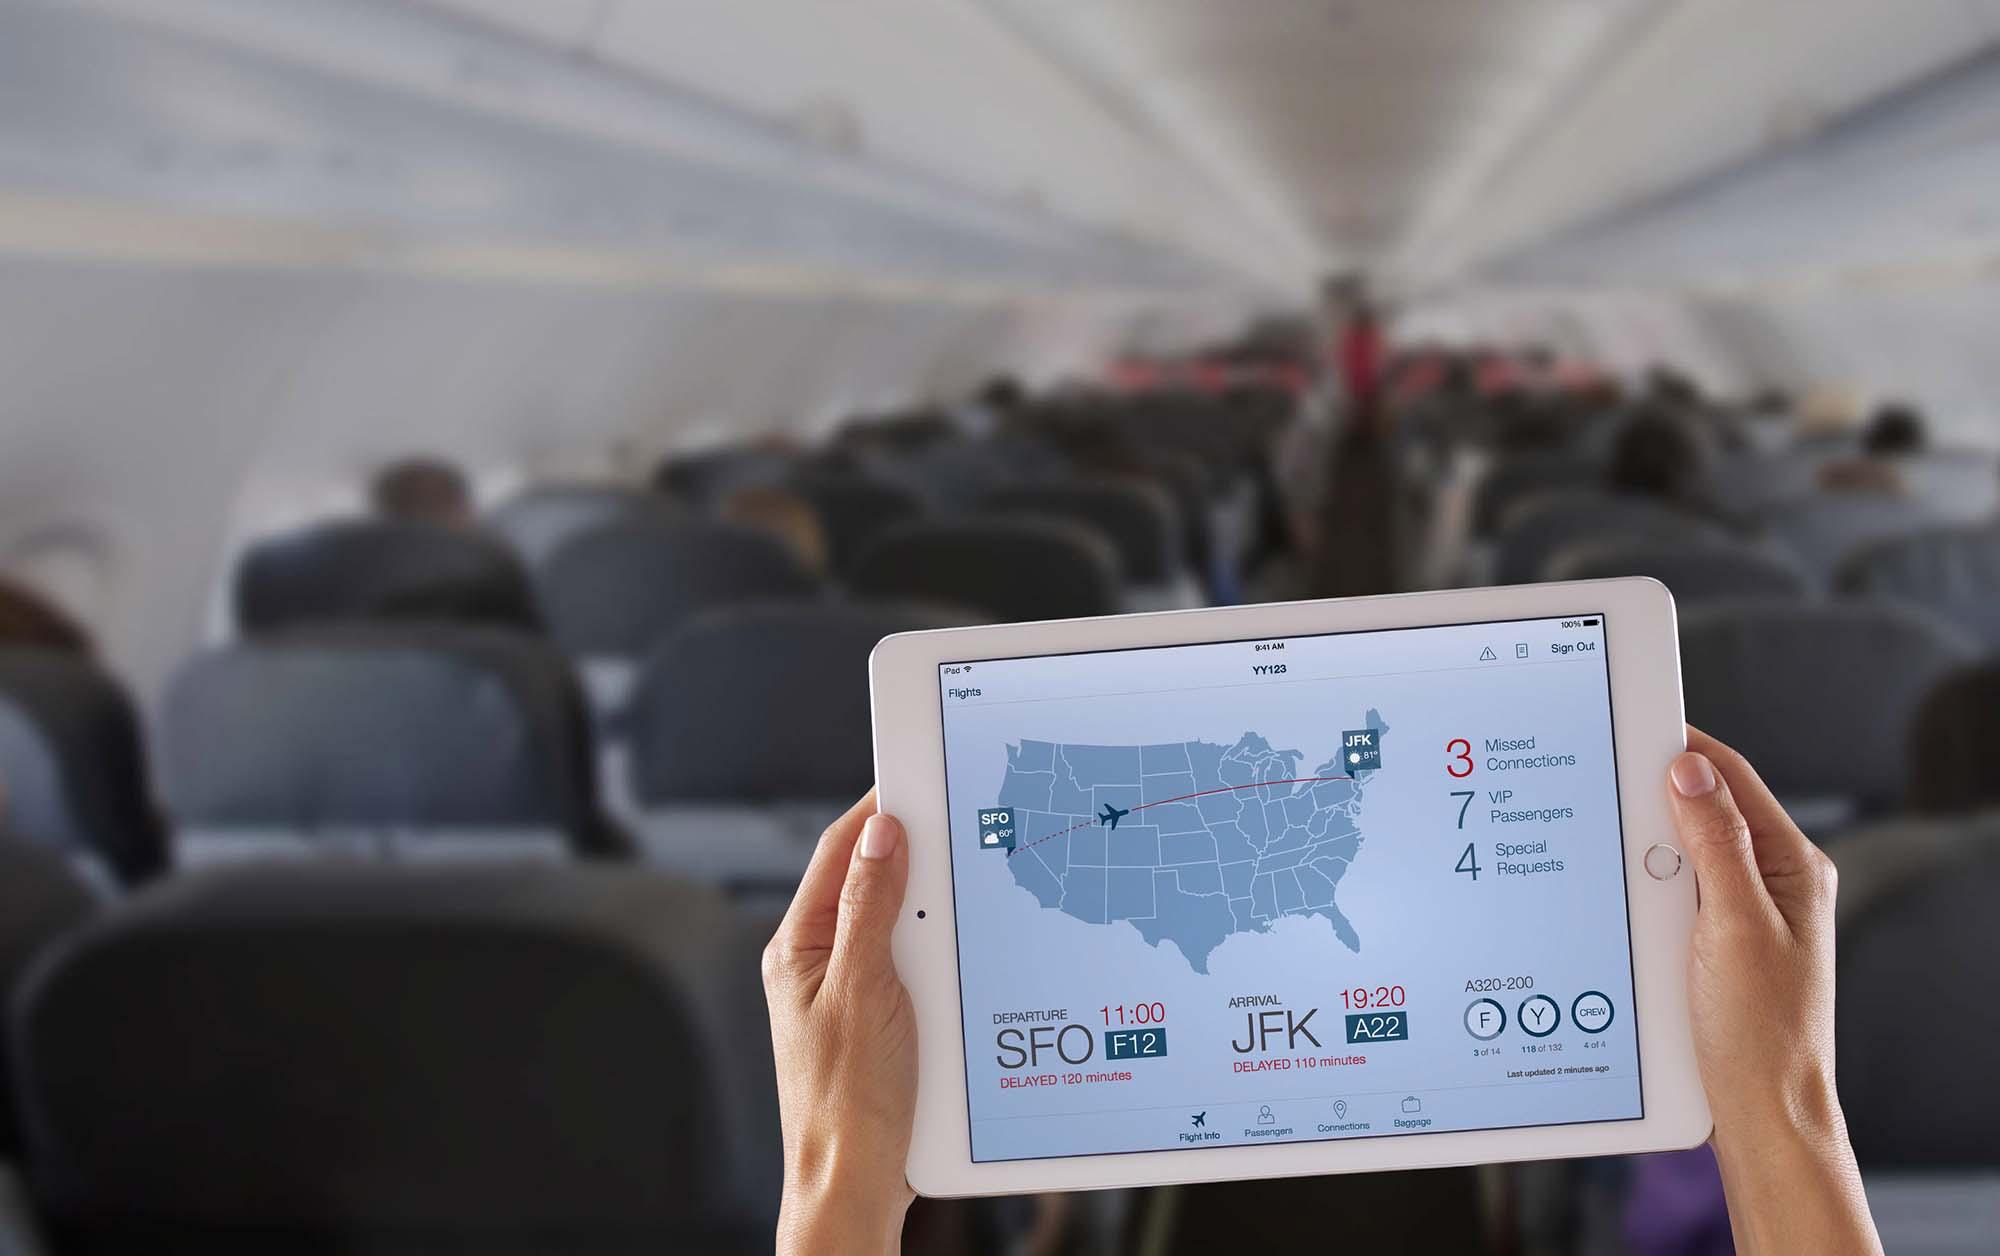 Apple-IBM mobile business application